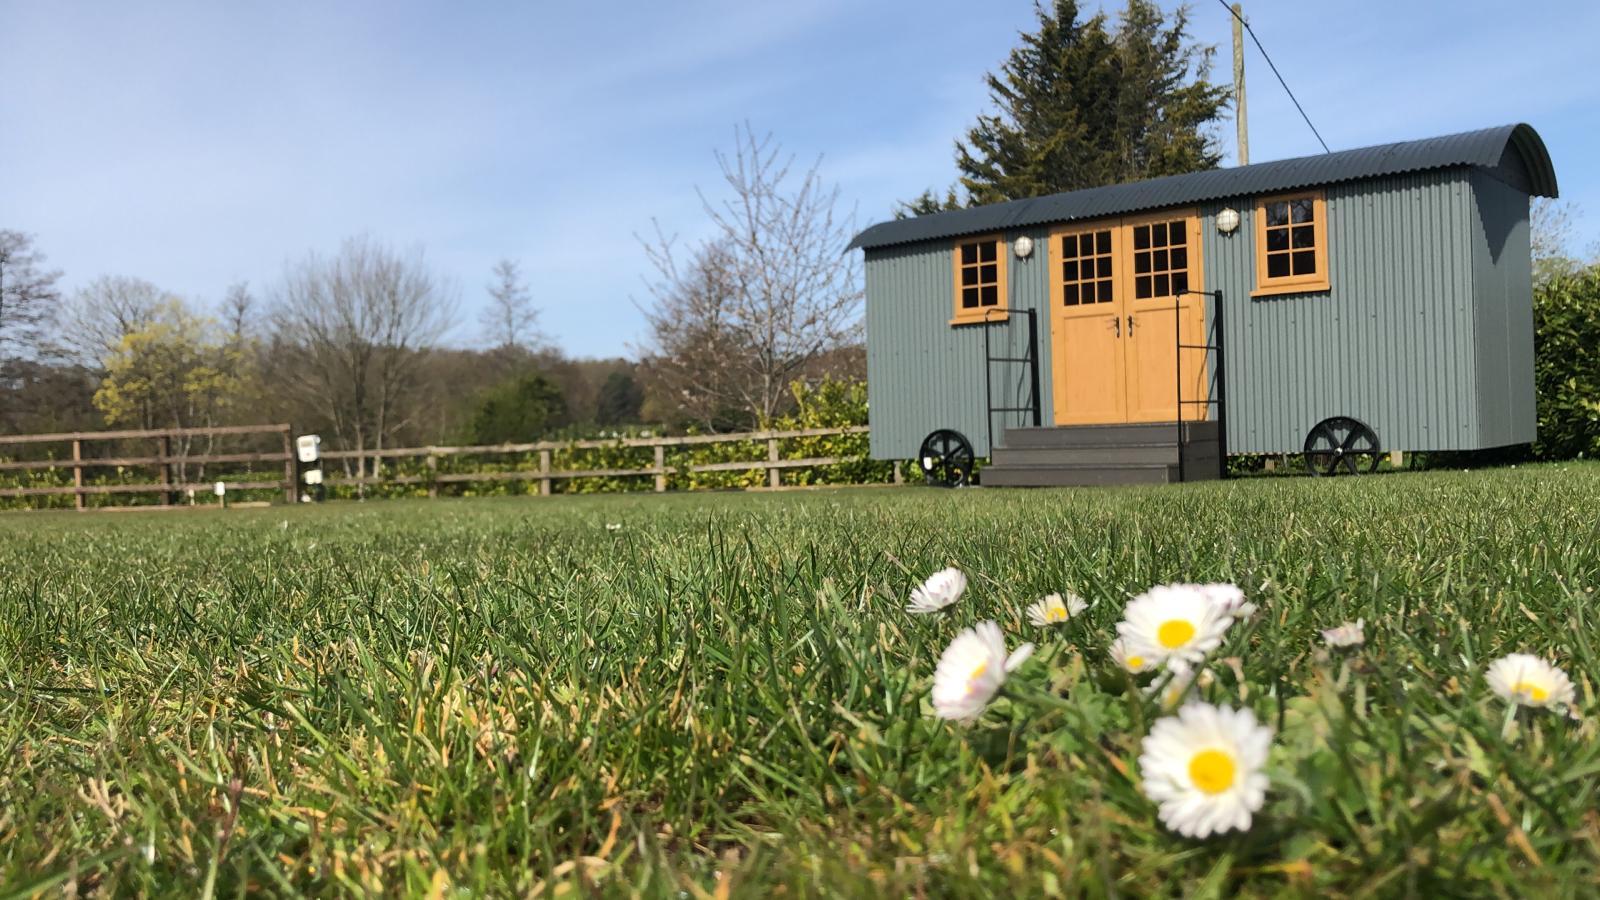 Shepherd Hut in Spring time